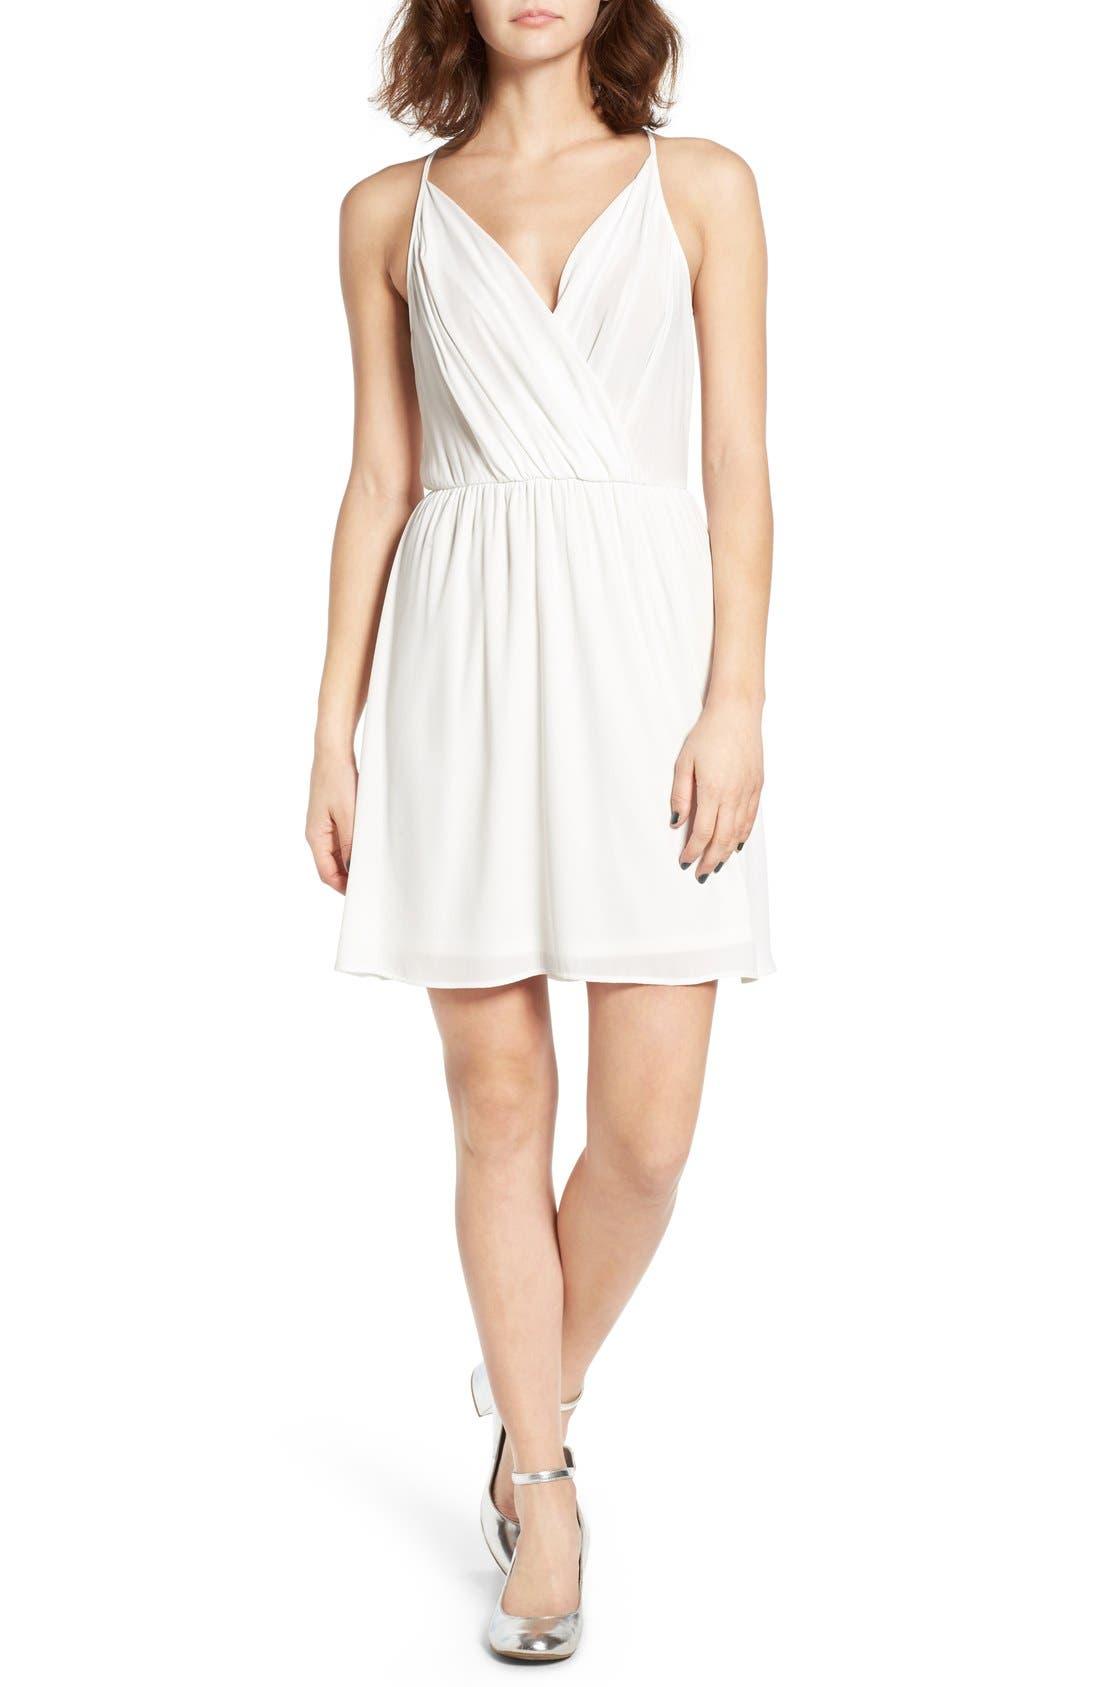 Main Image - Lush Surplice Camisole Dress